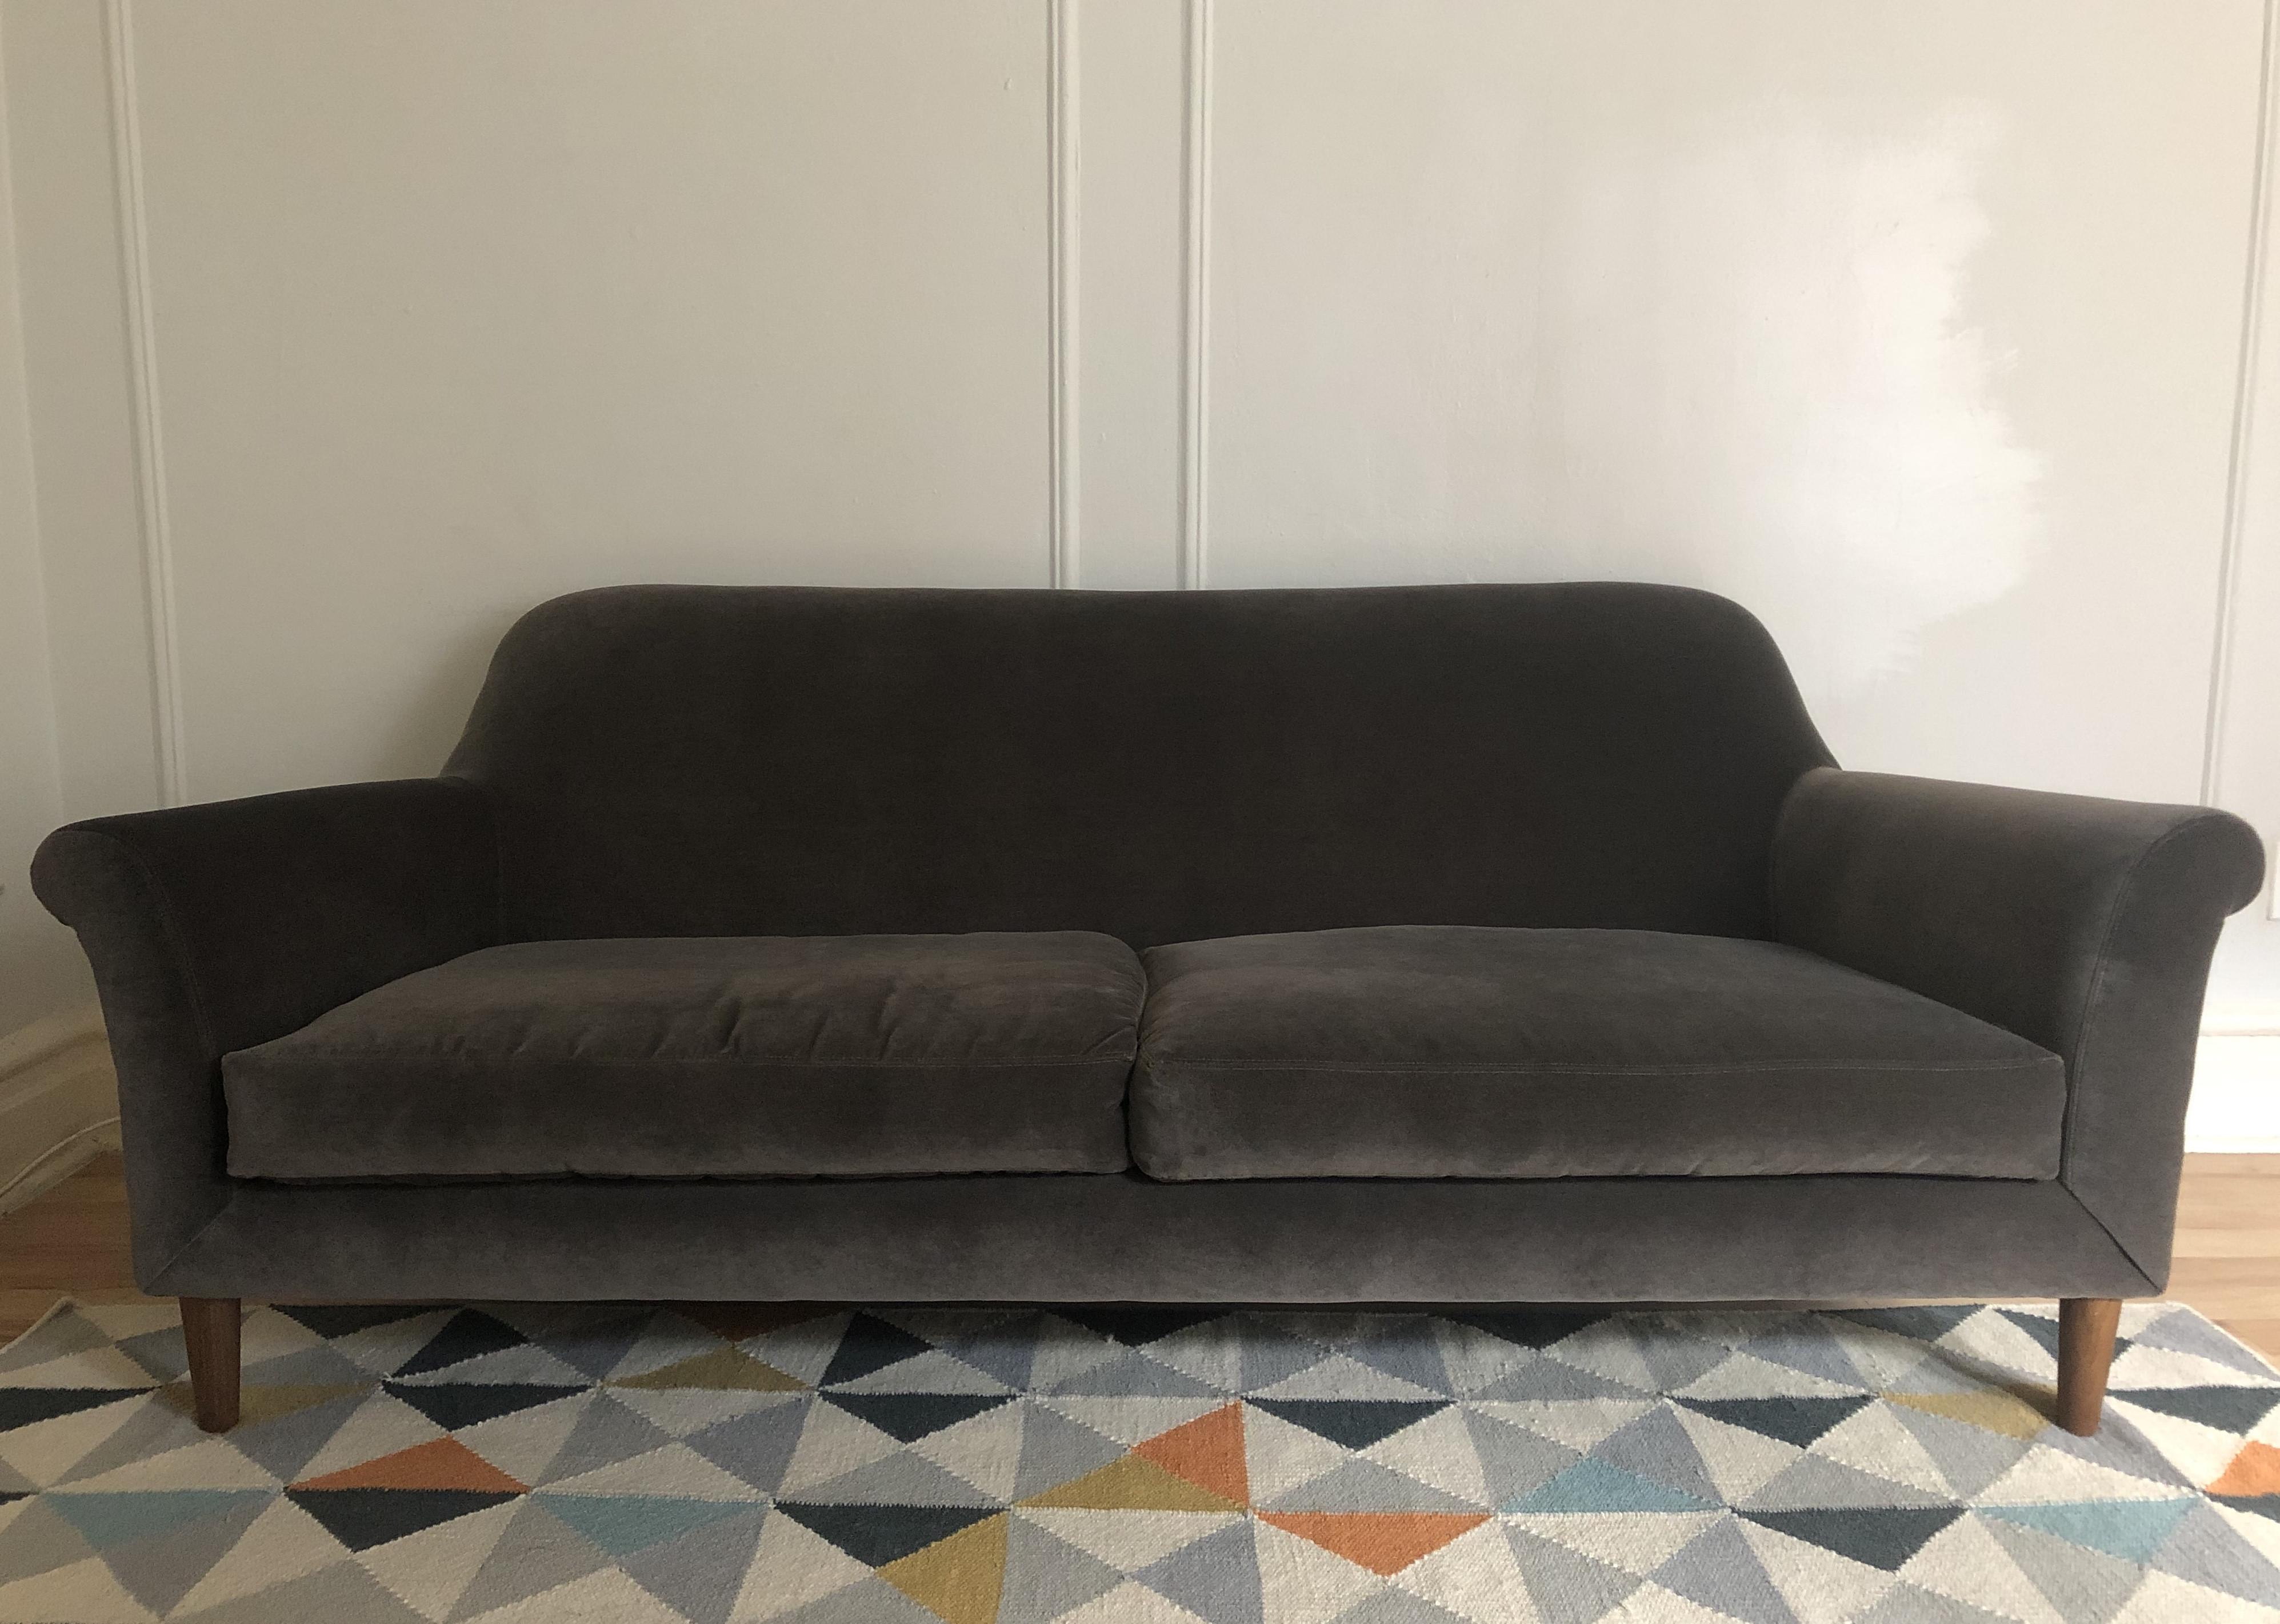 Crate & Barrel Cullen Apartment Sofa in Winthrop Graphite